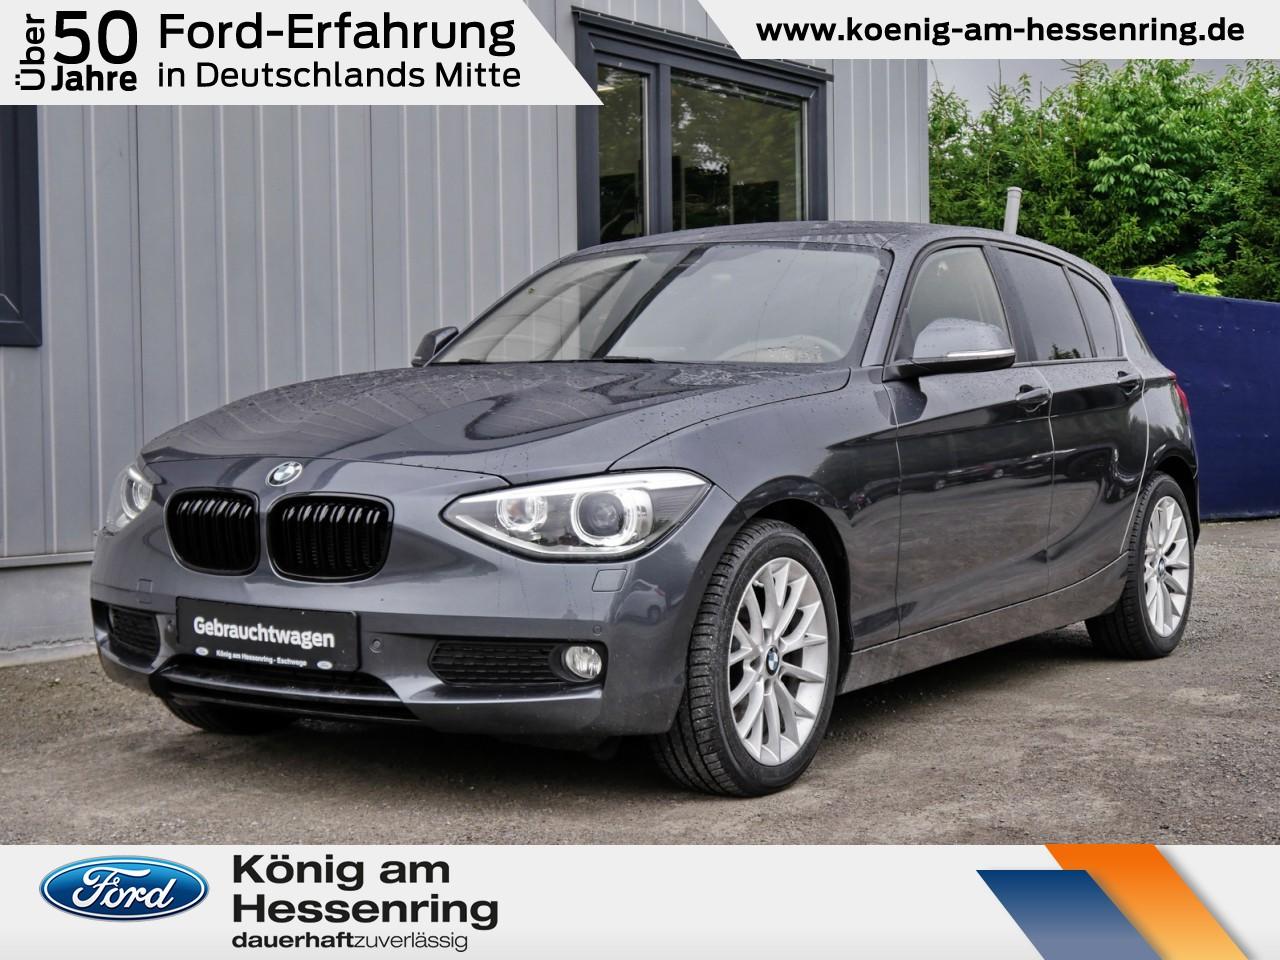 BMW 125i Aut.AHK+NAVI+Xenon+ParkAssistent+Klimaautom, Jahr 2014, Benzin